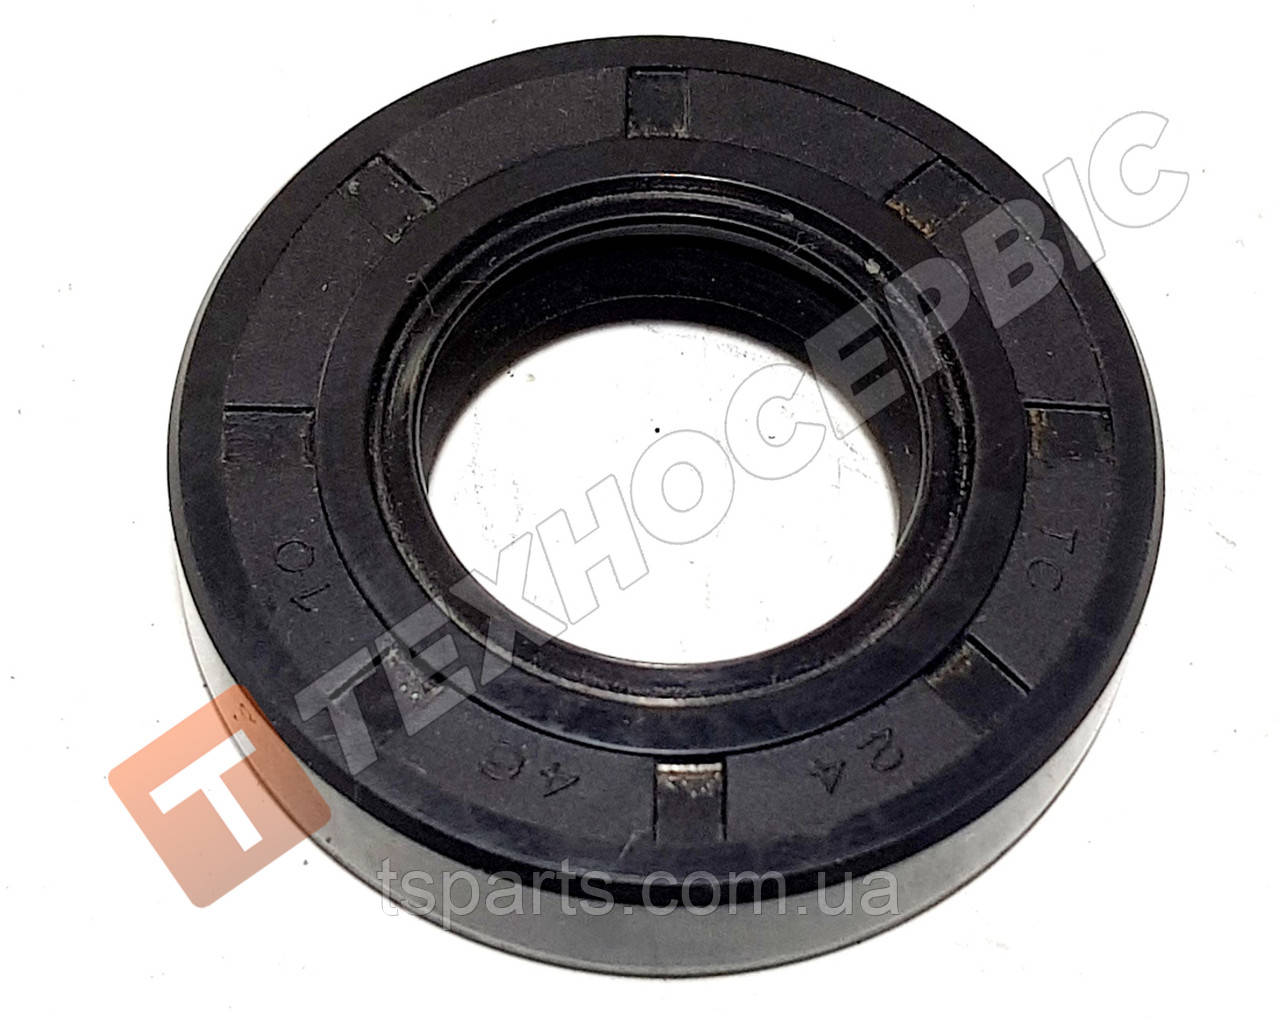 Сальник (манжета) компрессора ЗИЛ, МАЗ, гидроусилителя ЗИЛ 24-46-11.5-2.2 (309777-П) (120-3509070)